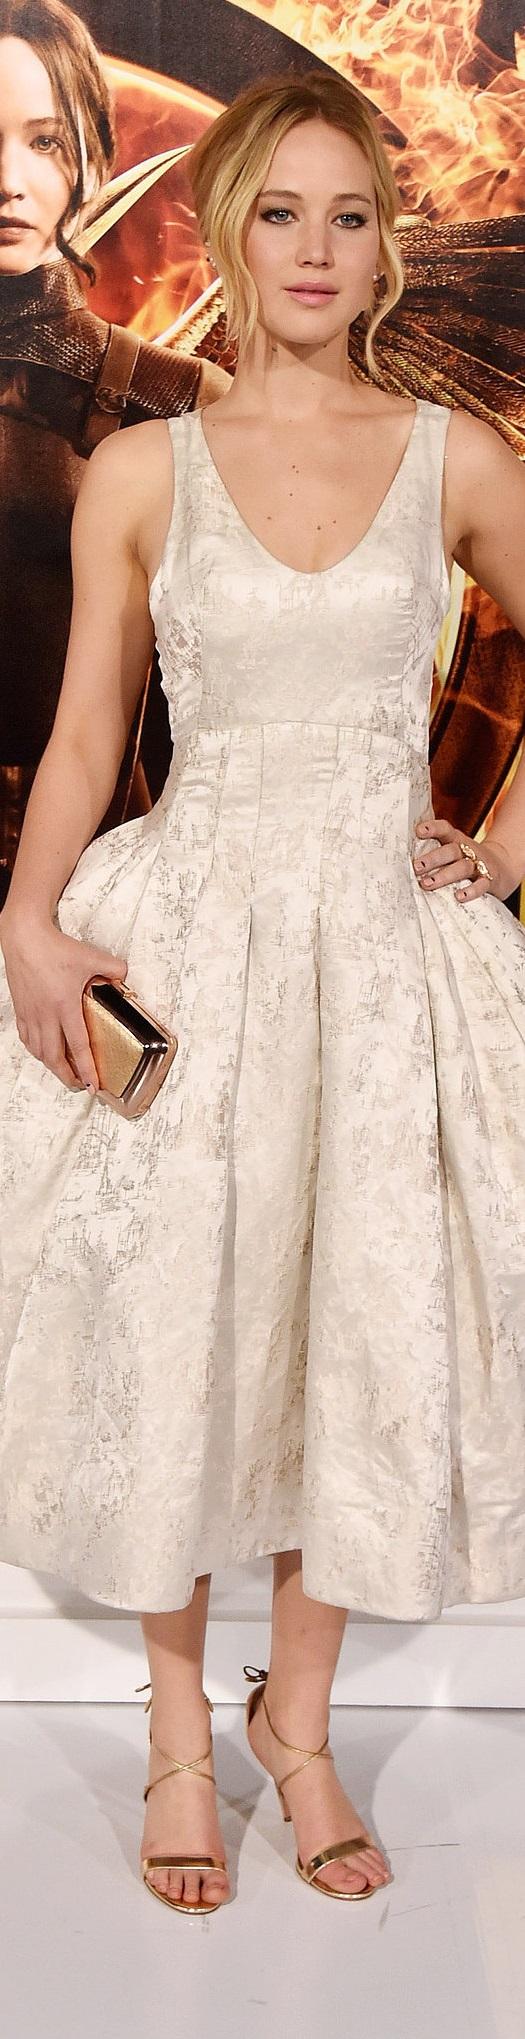 Jennifer Lawrence in Dior ..rh | Gefällt